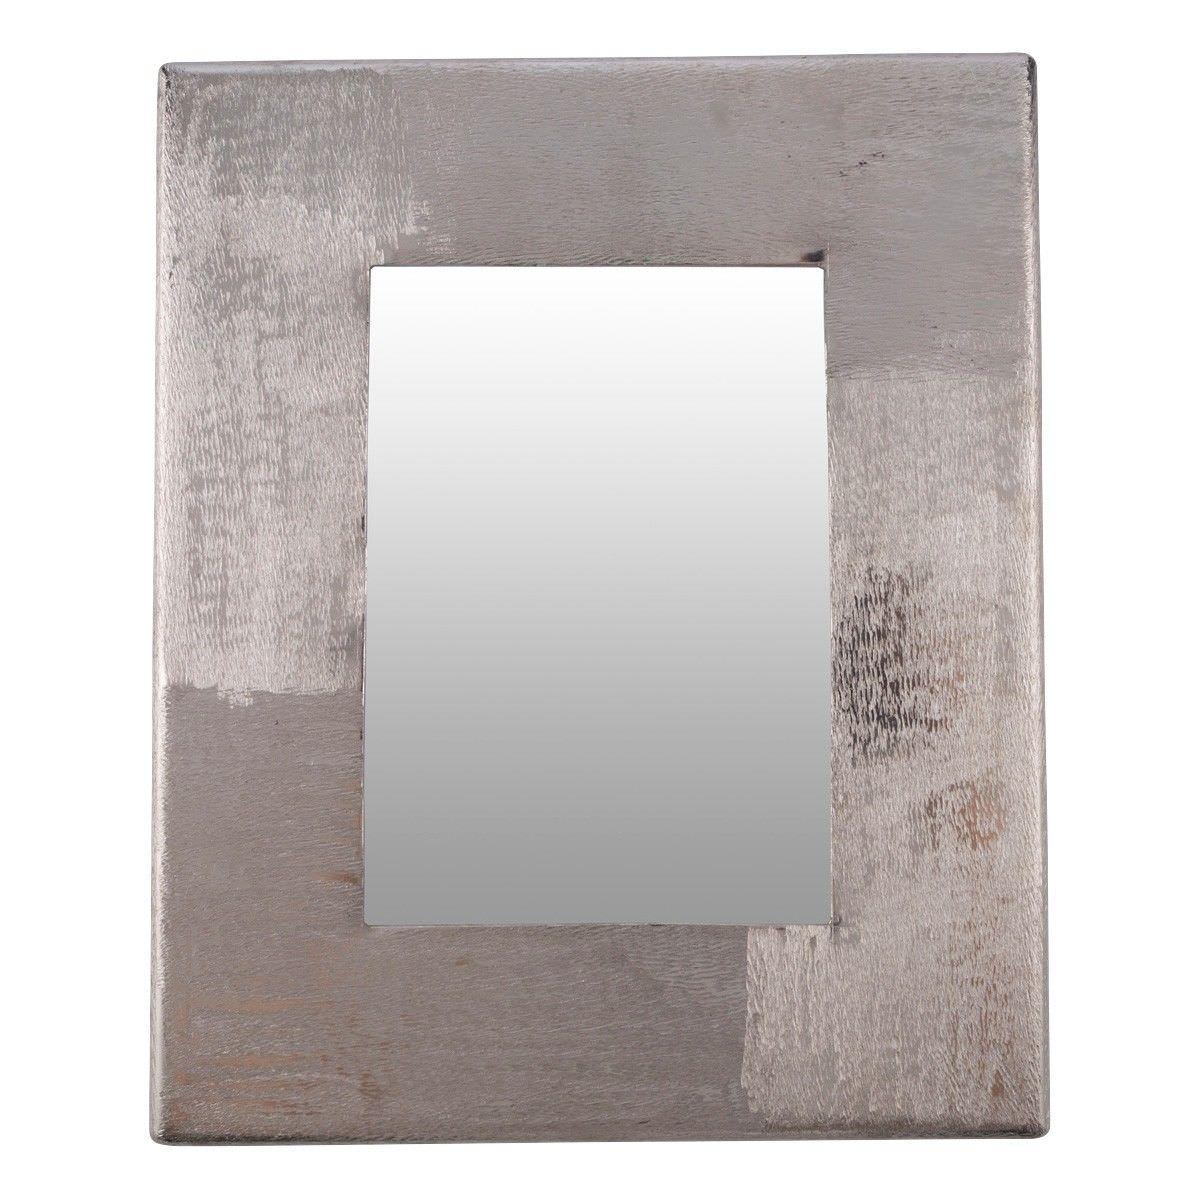 "Bromley Aluminium Photo Frame, 4x6"", Dark Silver"